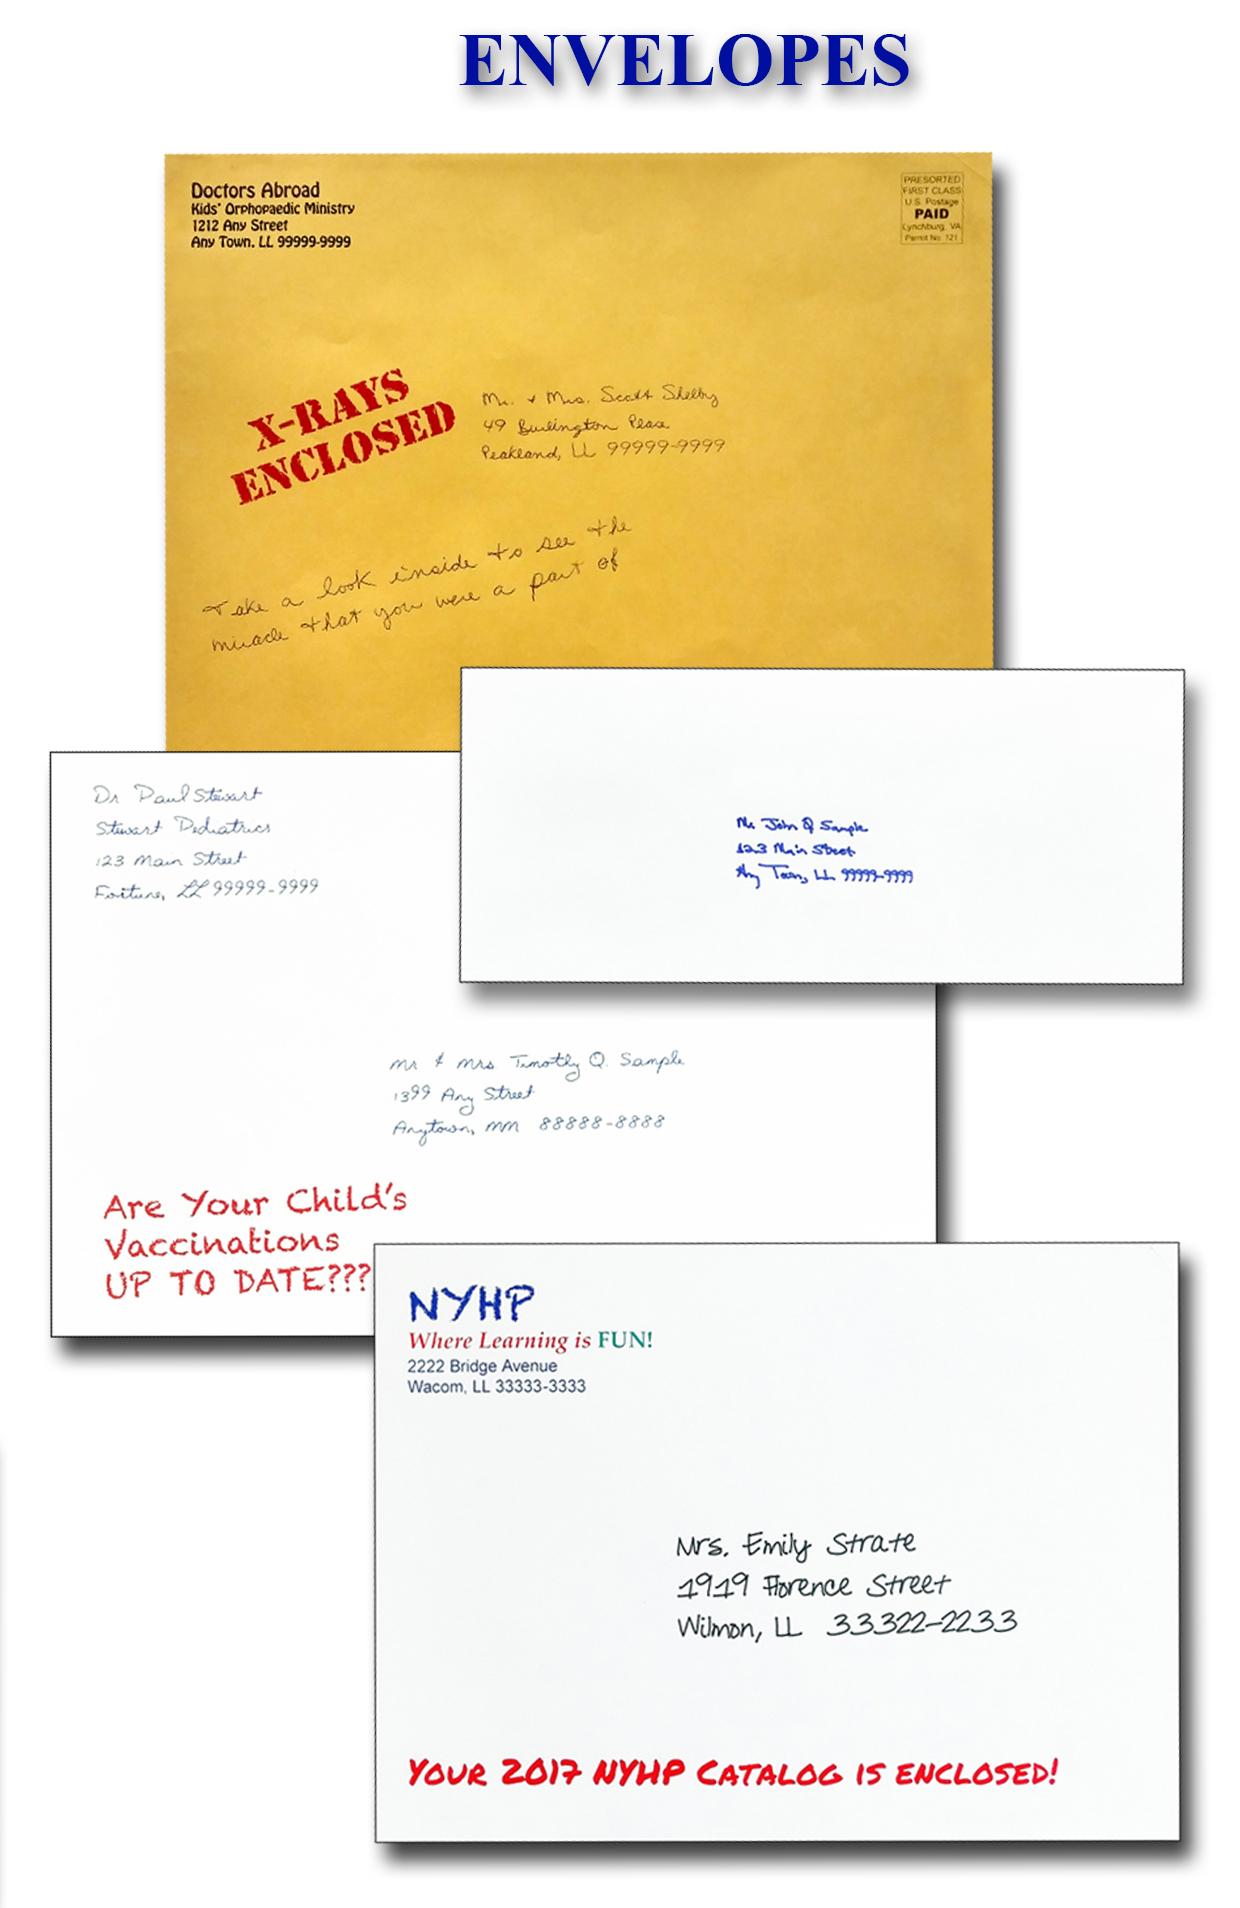 Envelopes - Real Pen Samples for Webpage.jpg